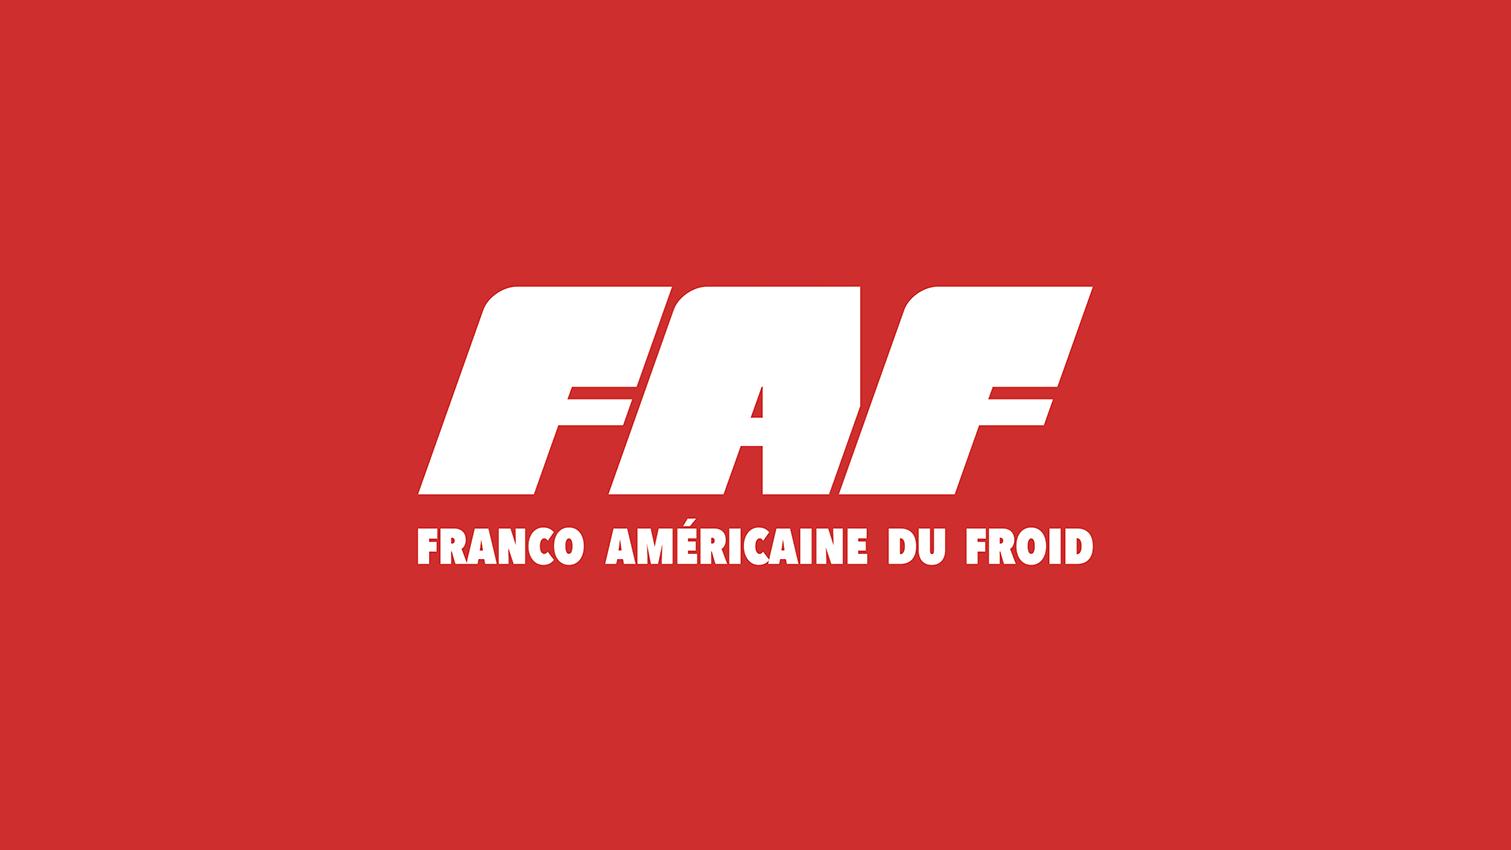 kretz+partners_project Faf cover.png